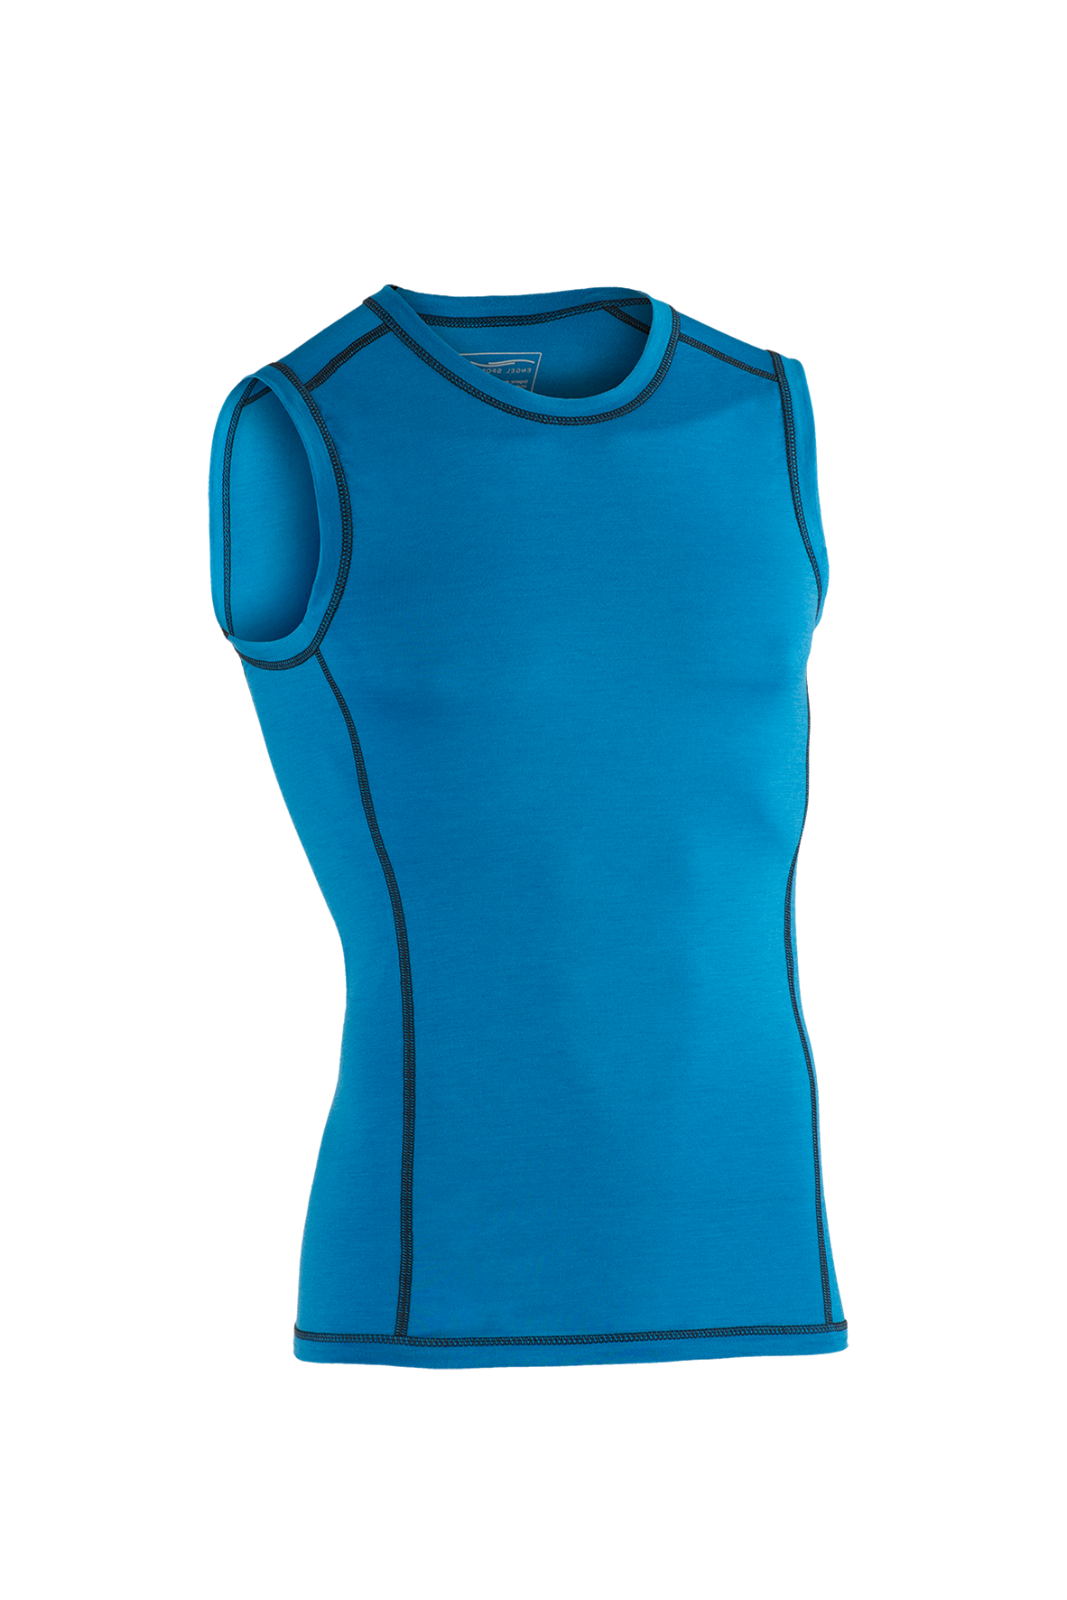 Engel Sports Herren Tank Top Shirt blau sky ESM150202020 Funktionswäsche GOTS